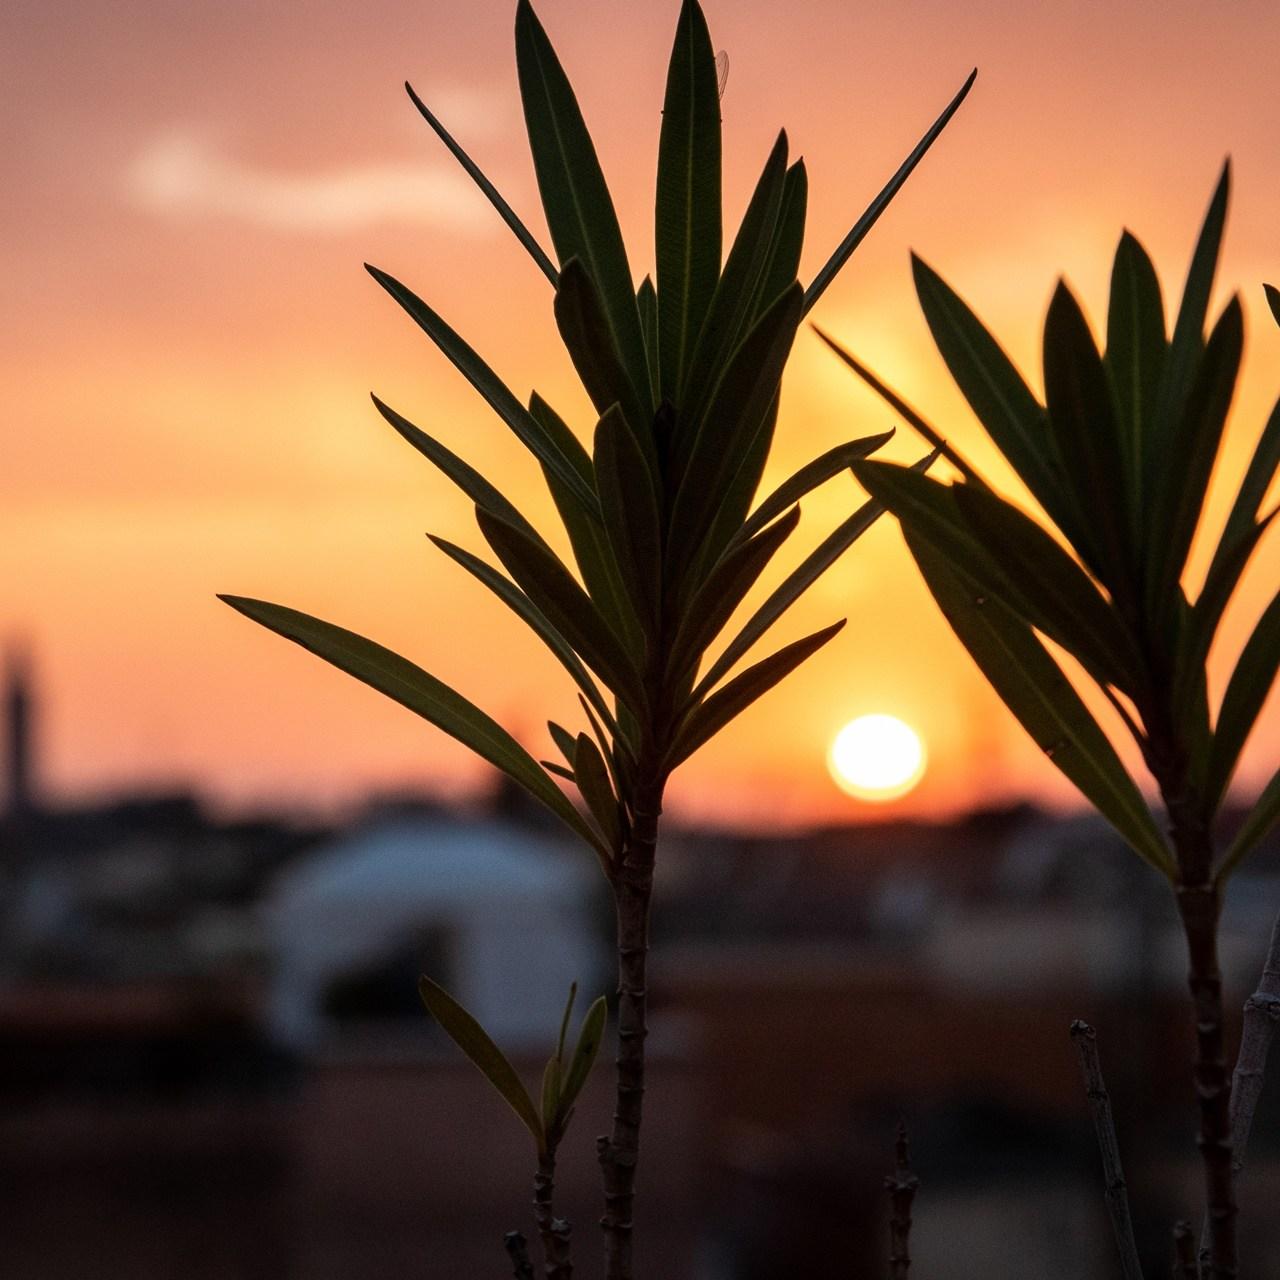 Morrocco sunset